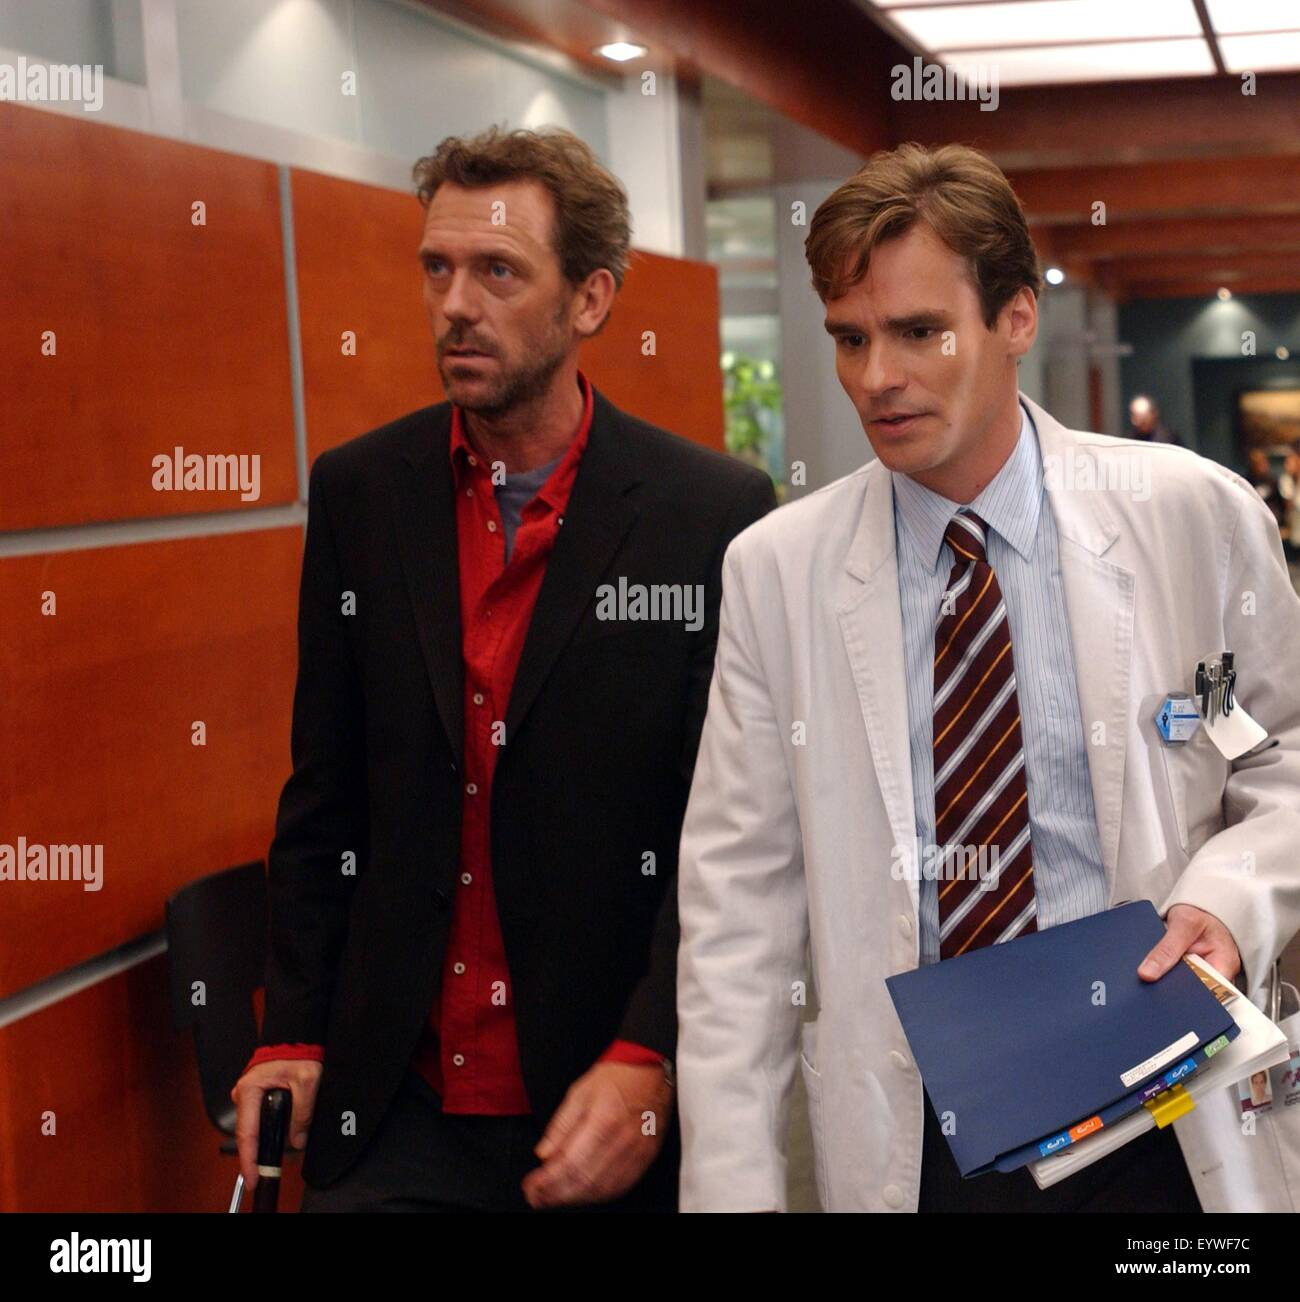 House M.D. ; TV Series 2004   ???? USA ; 2004 Season 1, Episode 6: The  Socratic Method ; Director : Peter Medak ; Hugh Laurie, Robert Sean Leonard  ; Richard ...